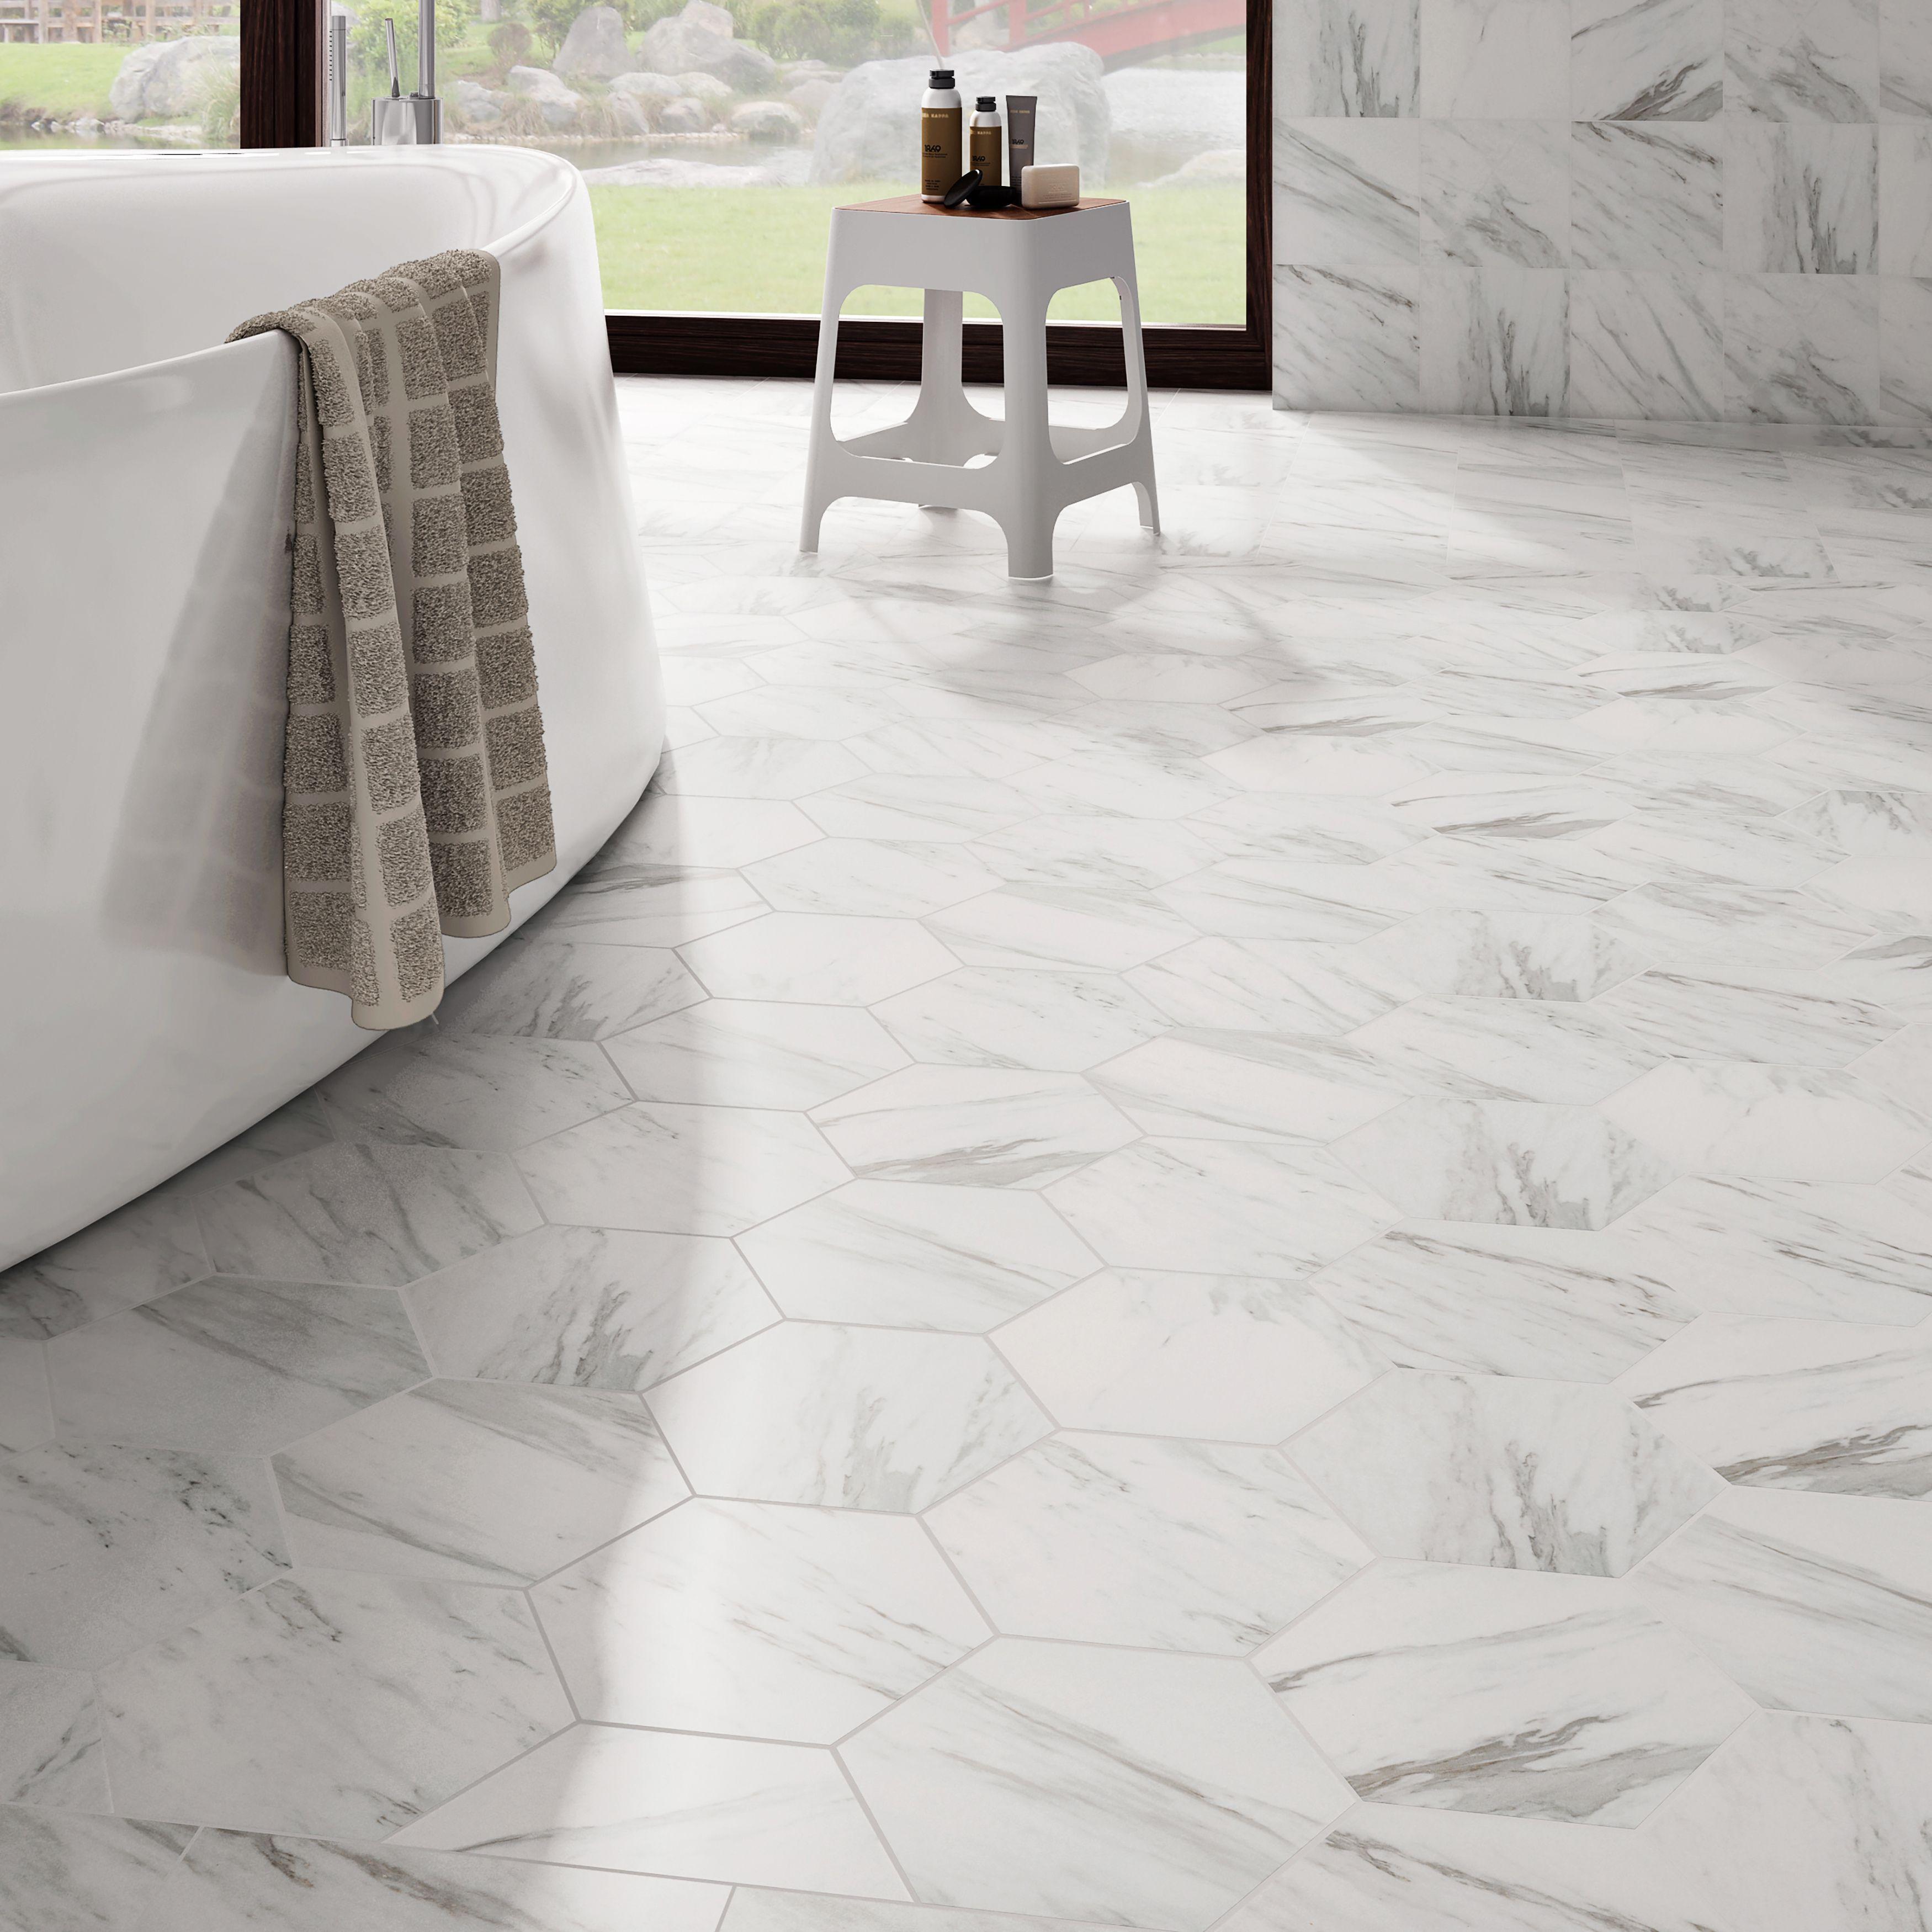 Somertile 8 625x9 875 Inch Marmol Carrara Hex Porcelain